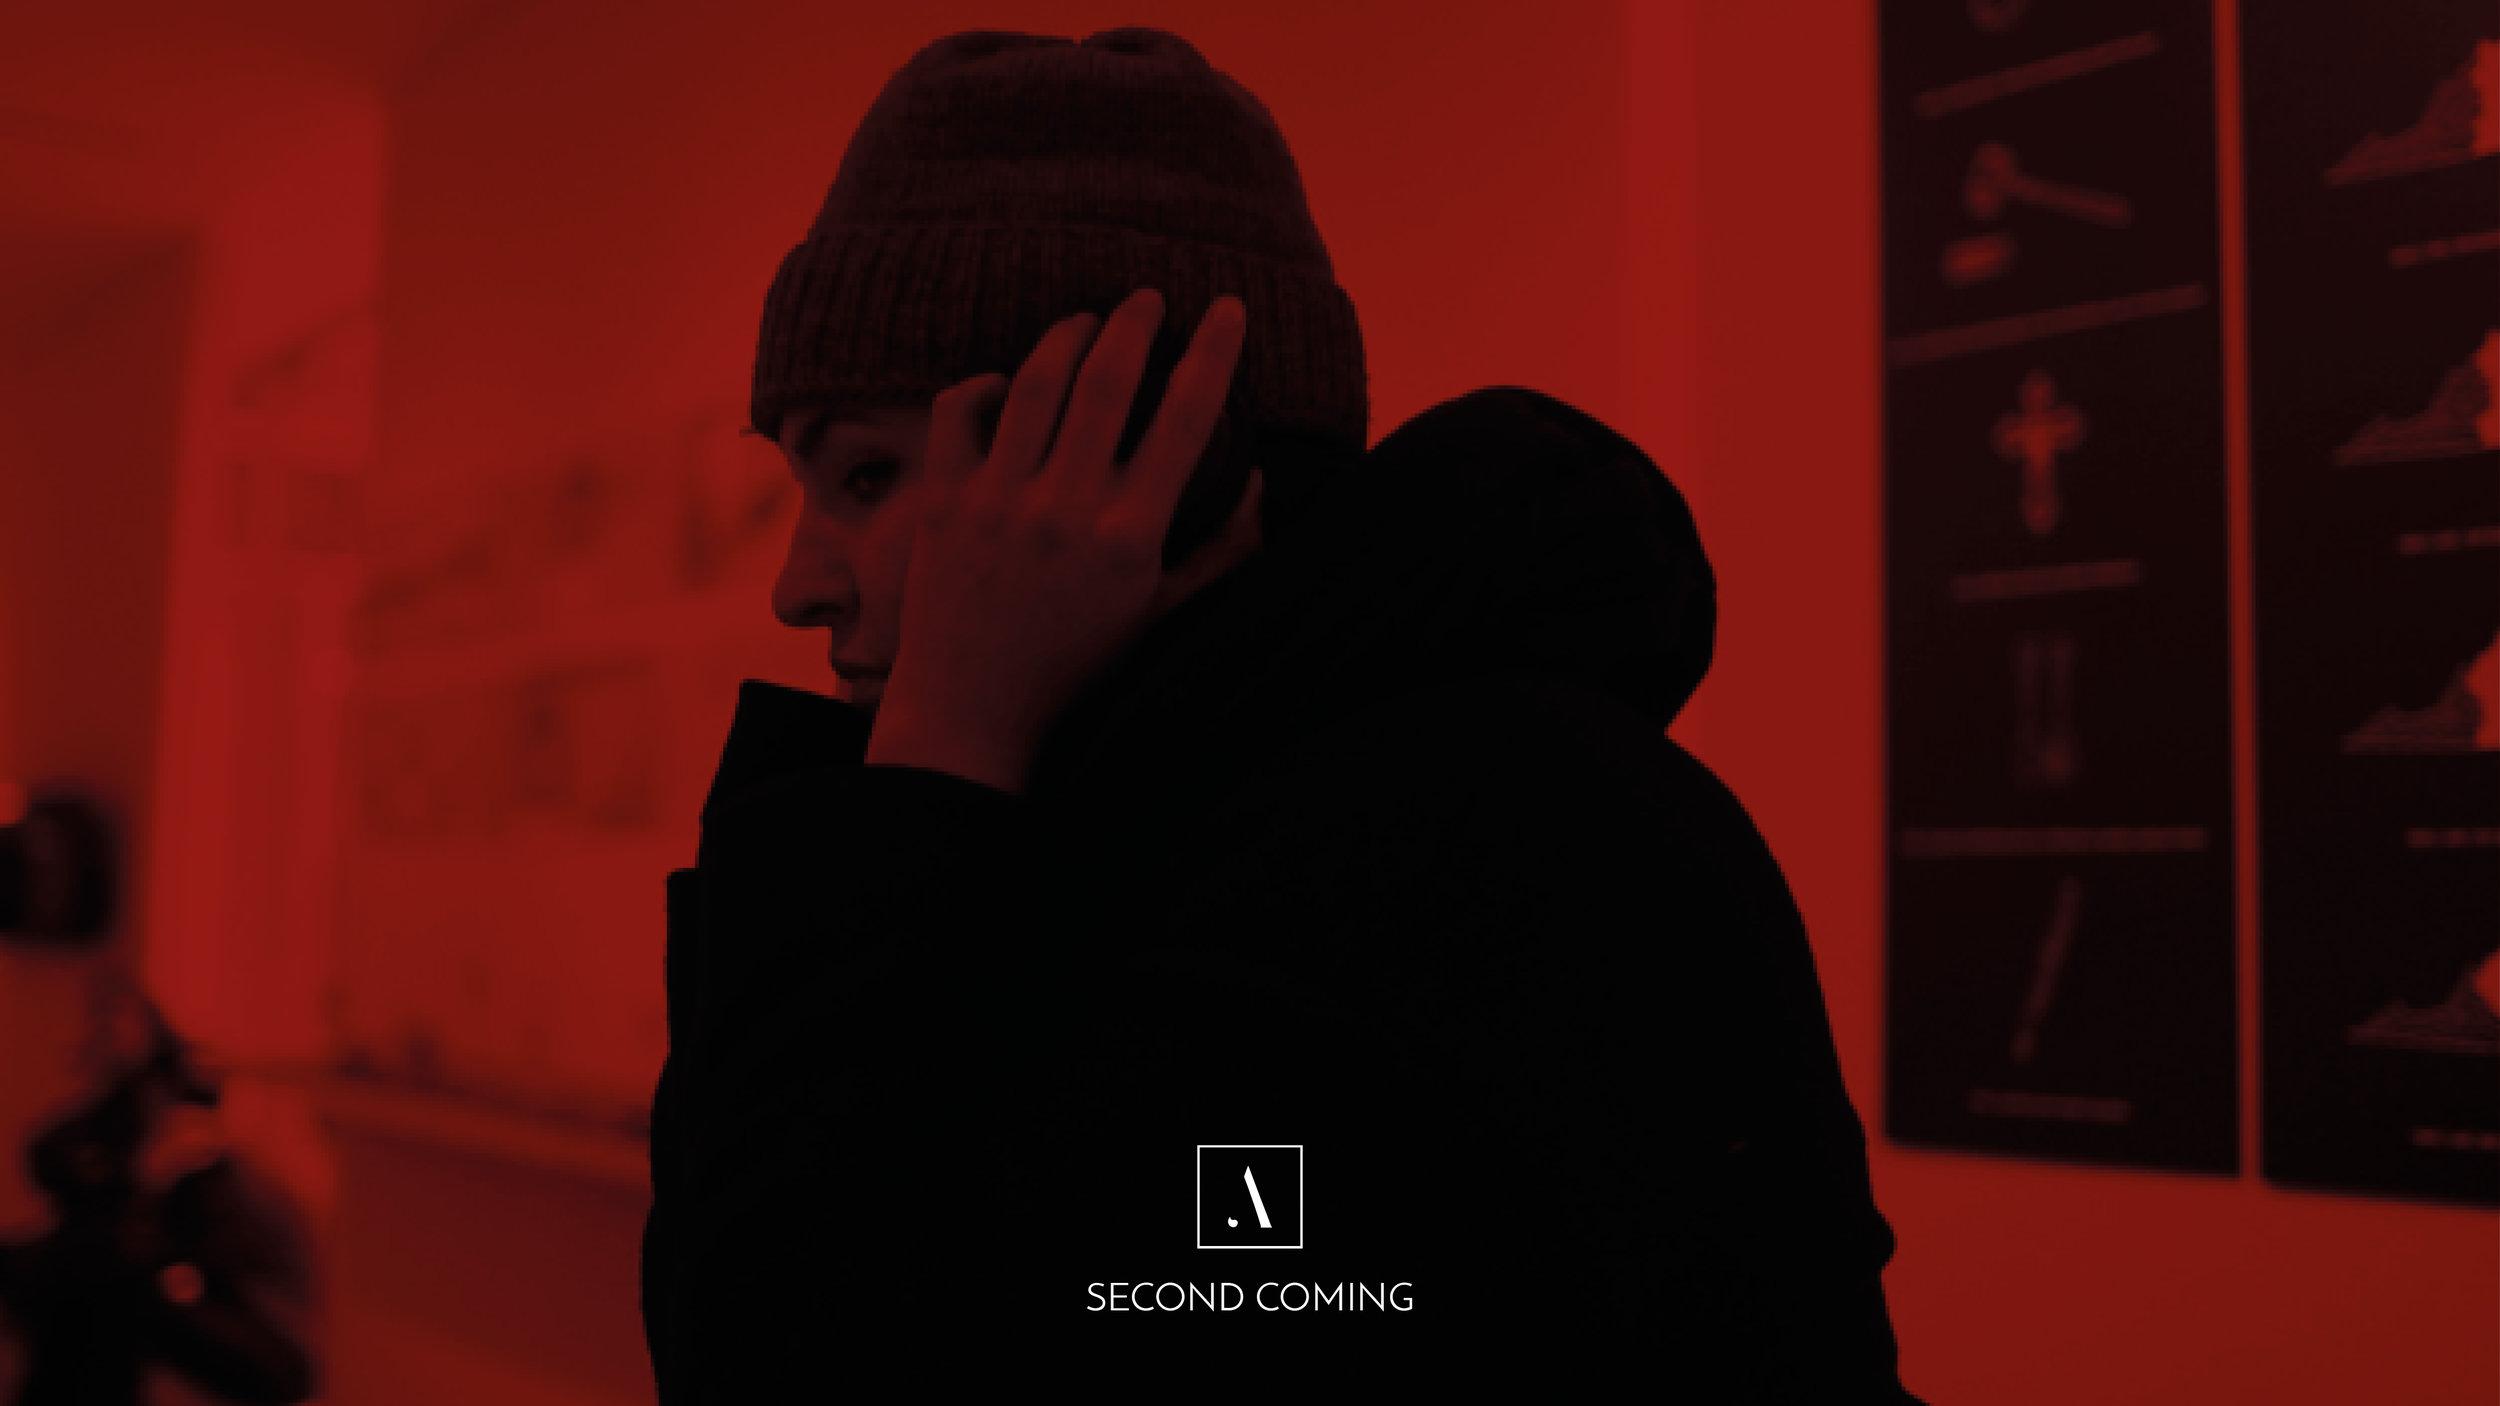 SECOND COMING (branded).jpg